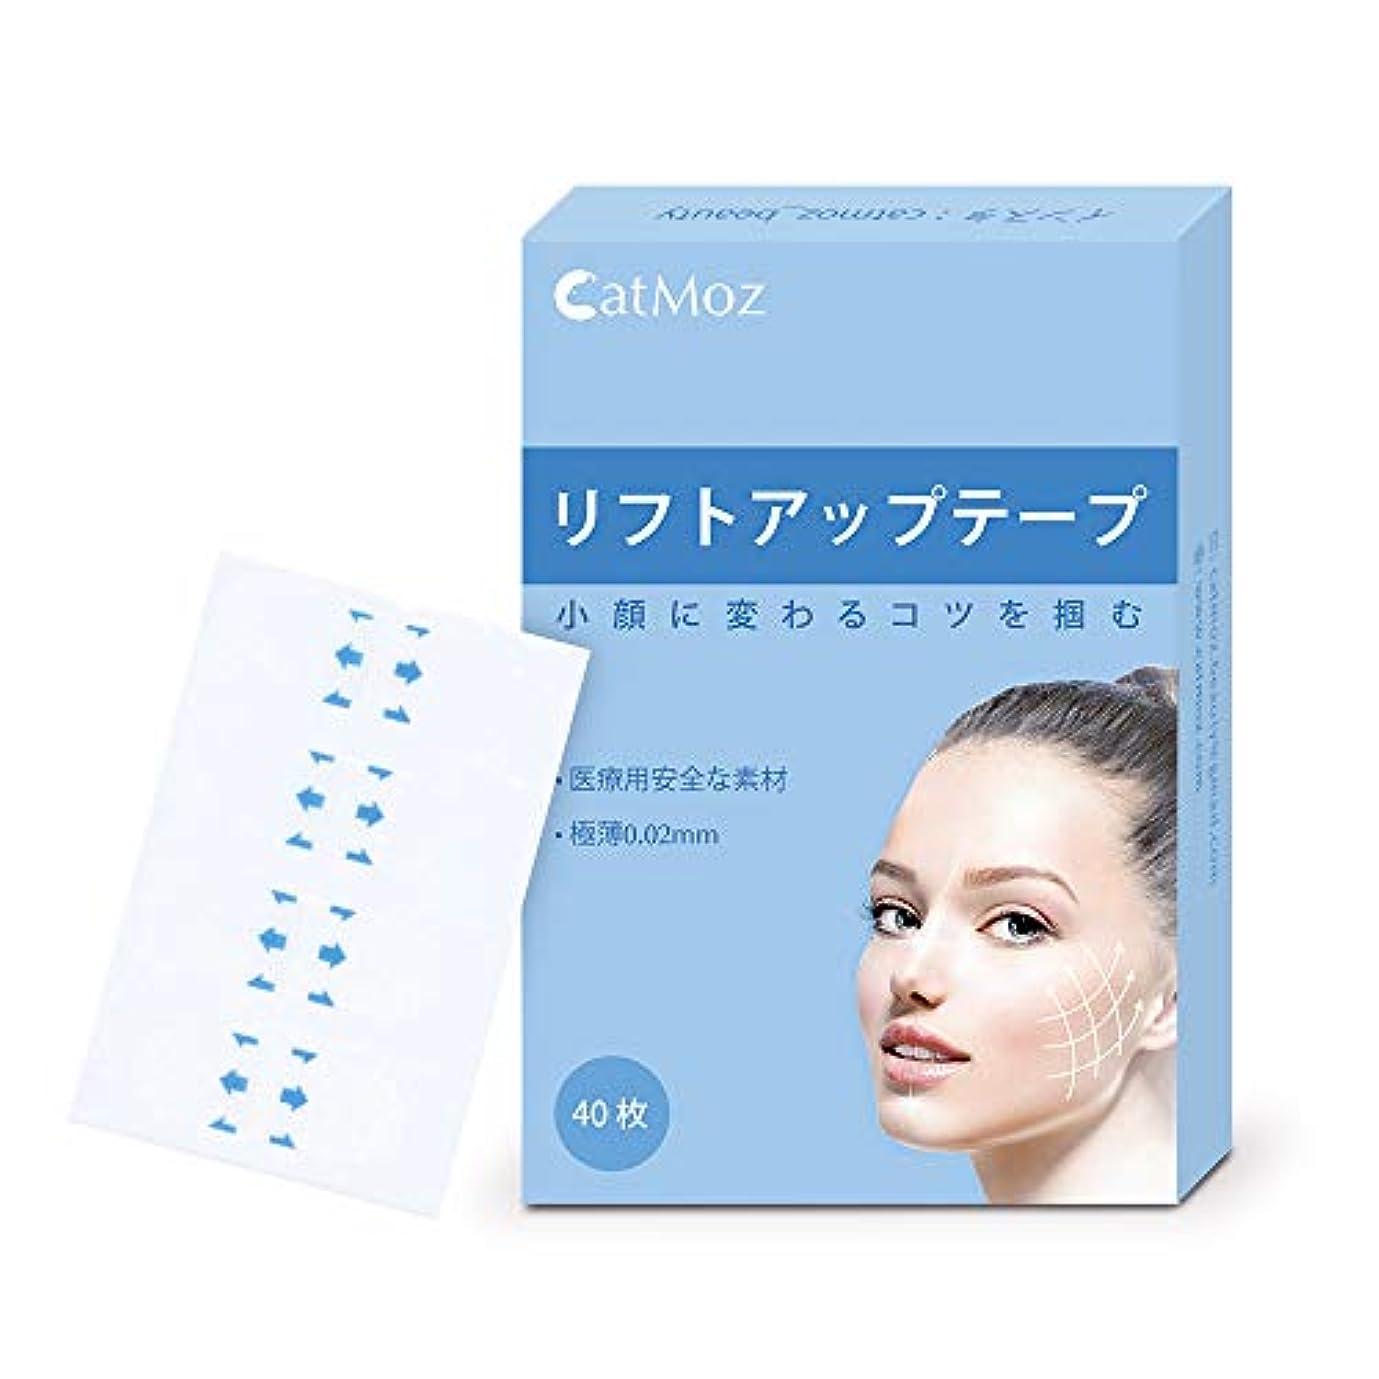 CatMoz 小顔テープ 美顔 たるみ ほうれい線 リフトアップテープ 40枚入り【超強力テープで小顔作れる】